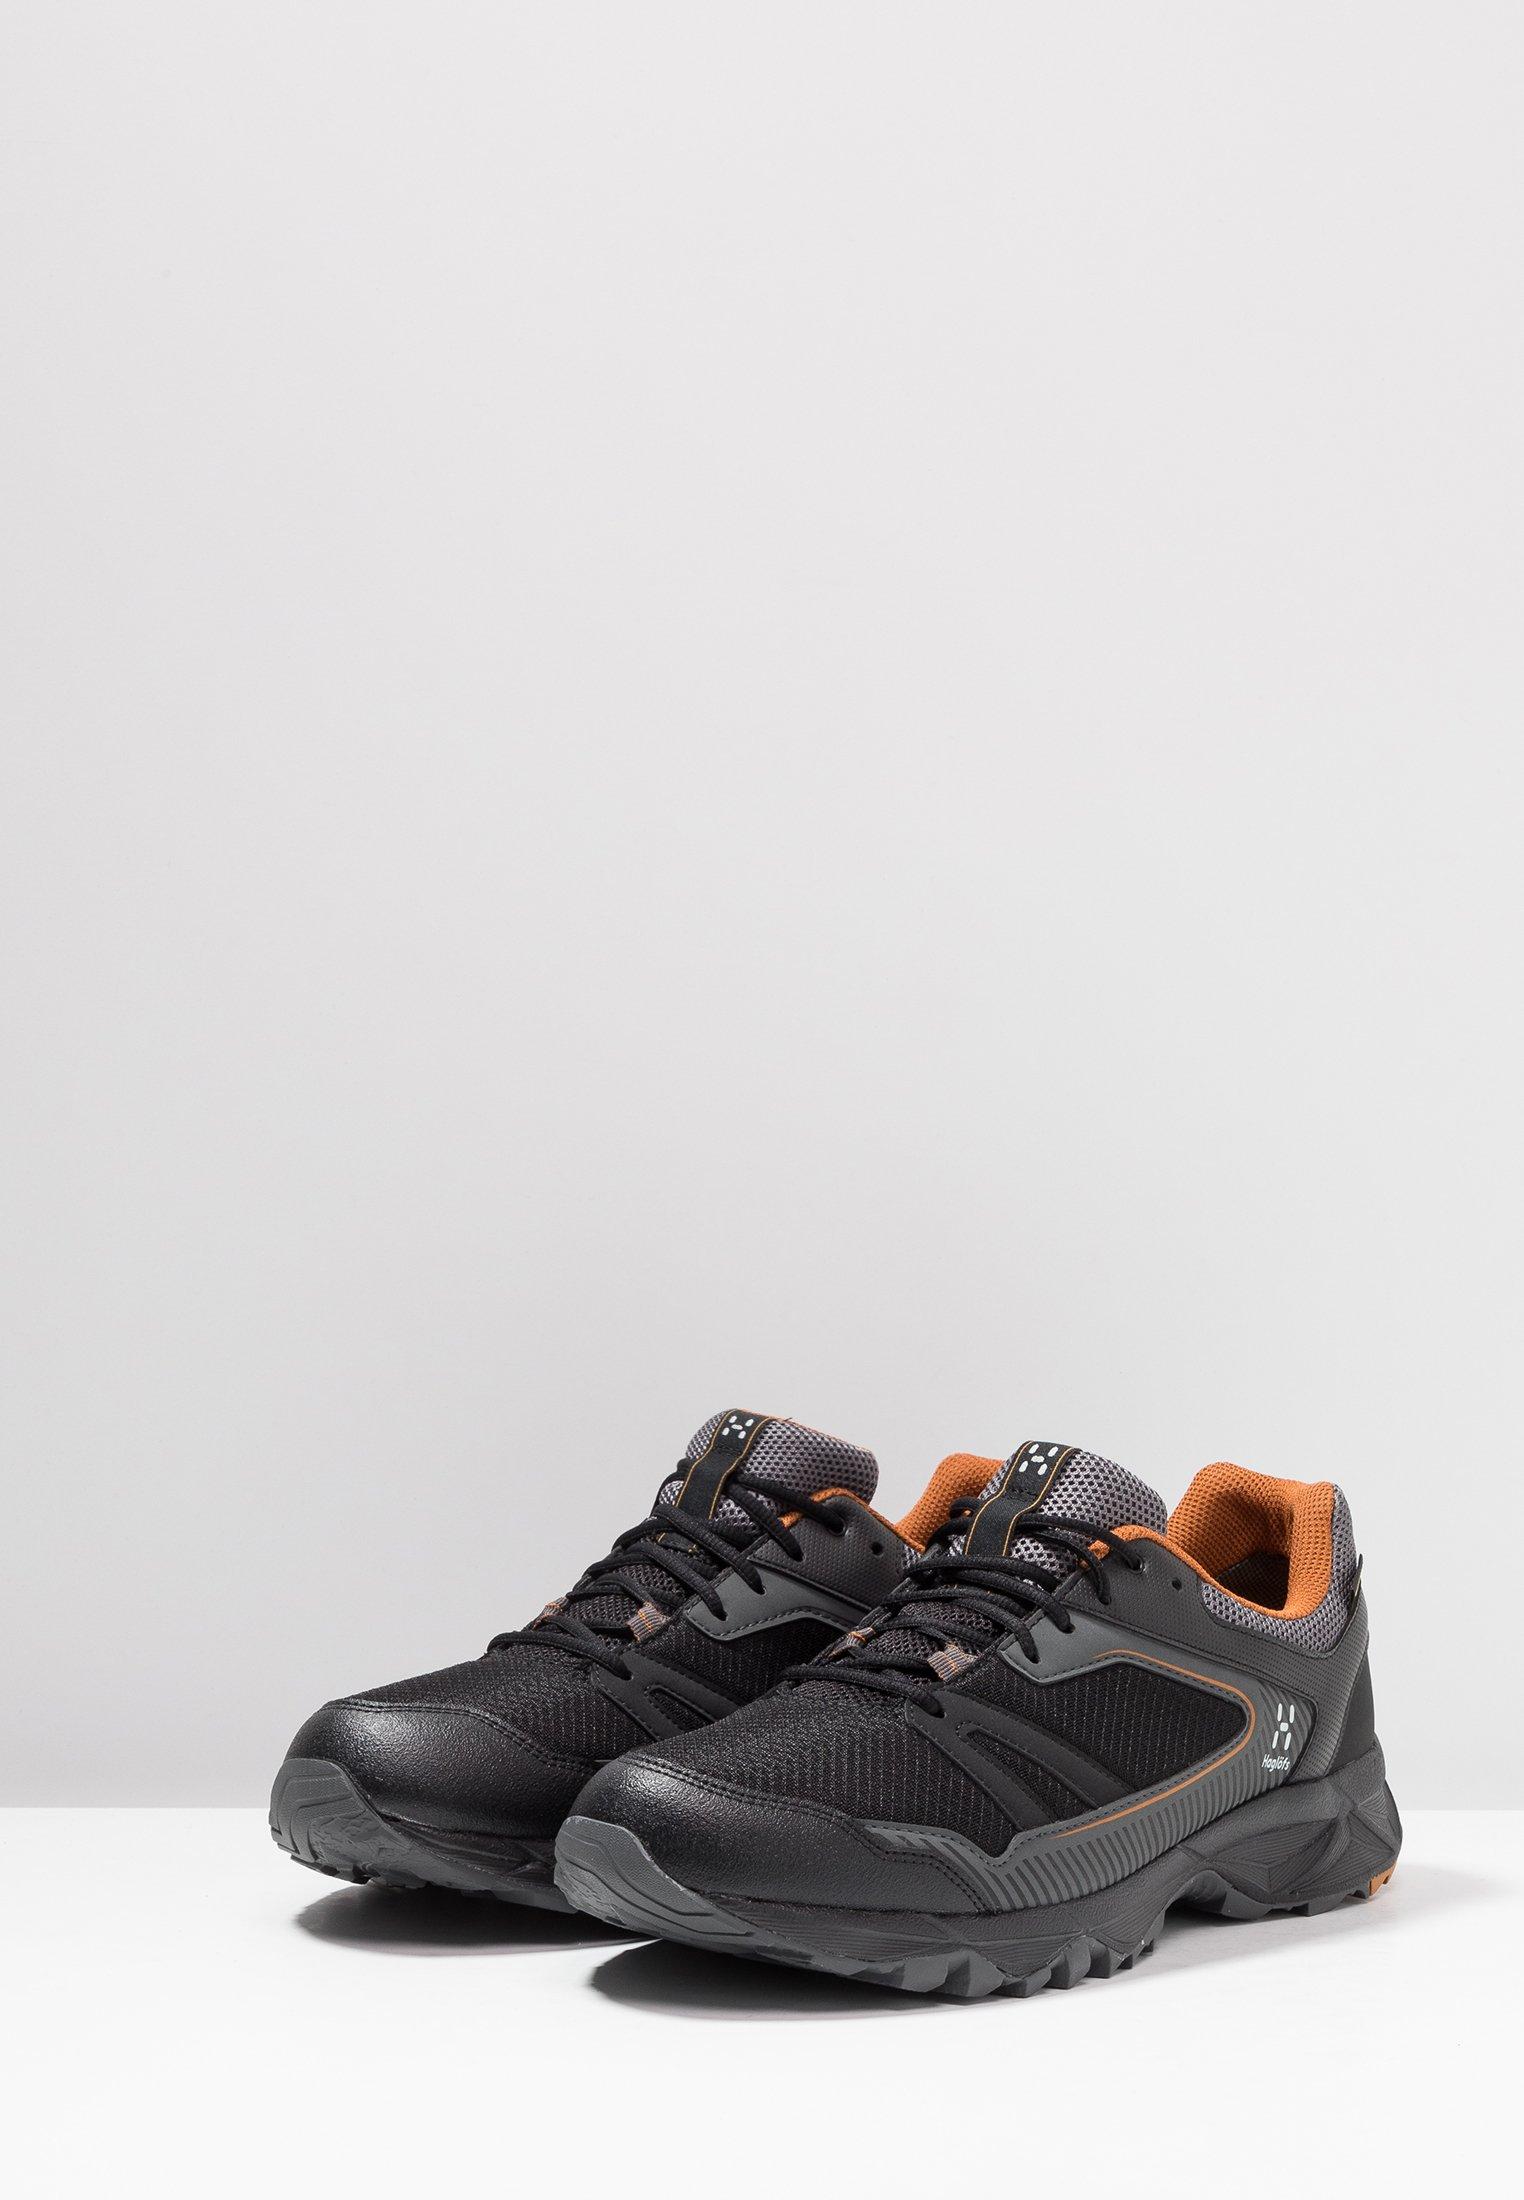 Haglofs Trail Fuse GT Men/'s Black